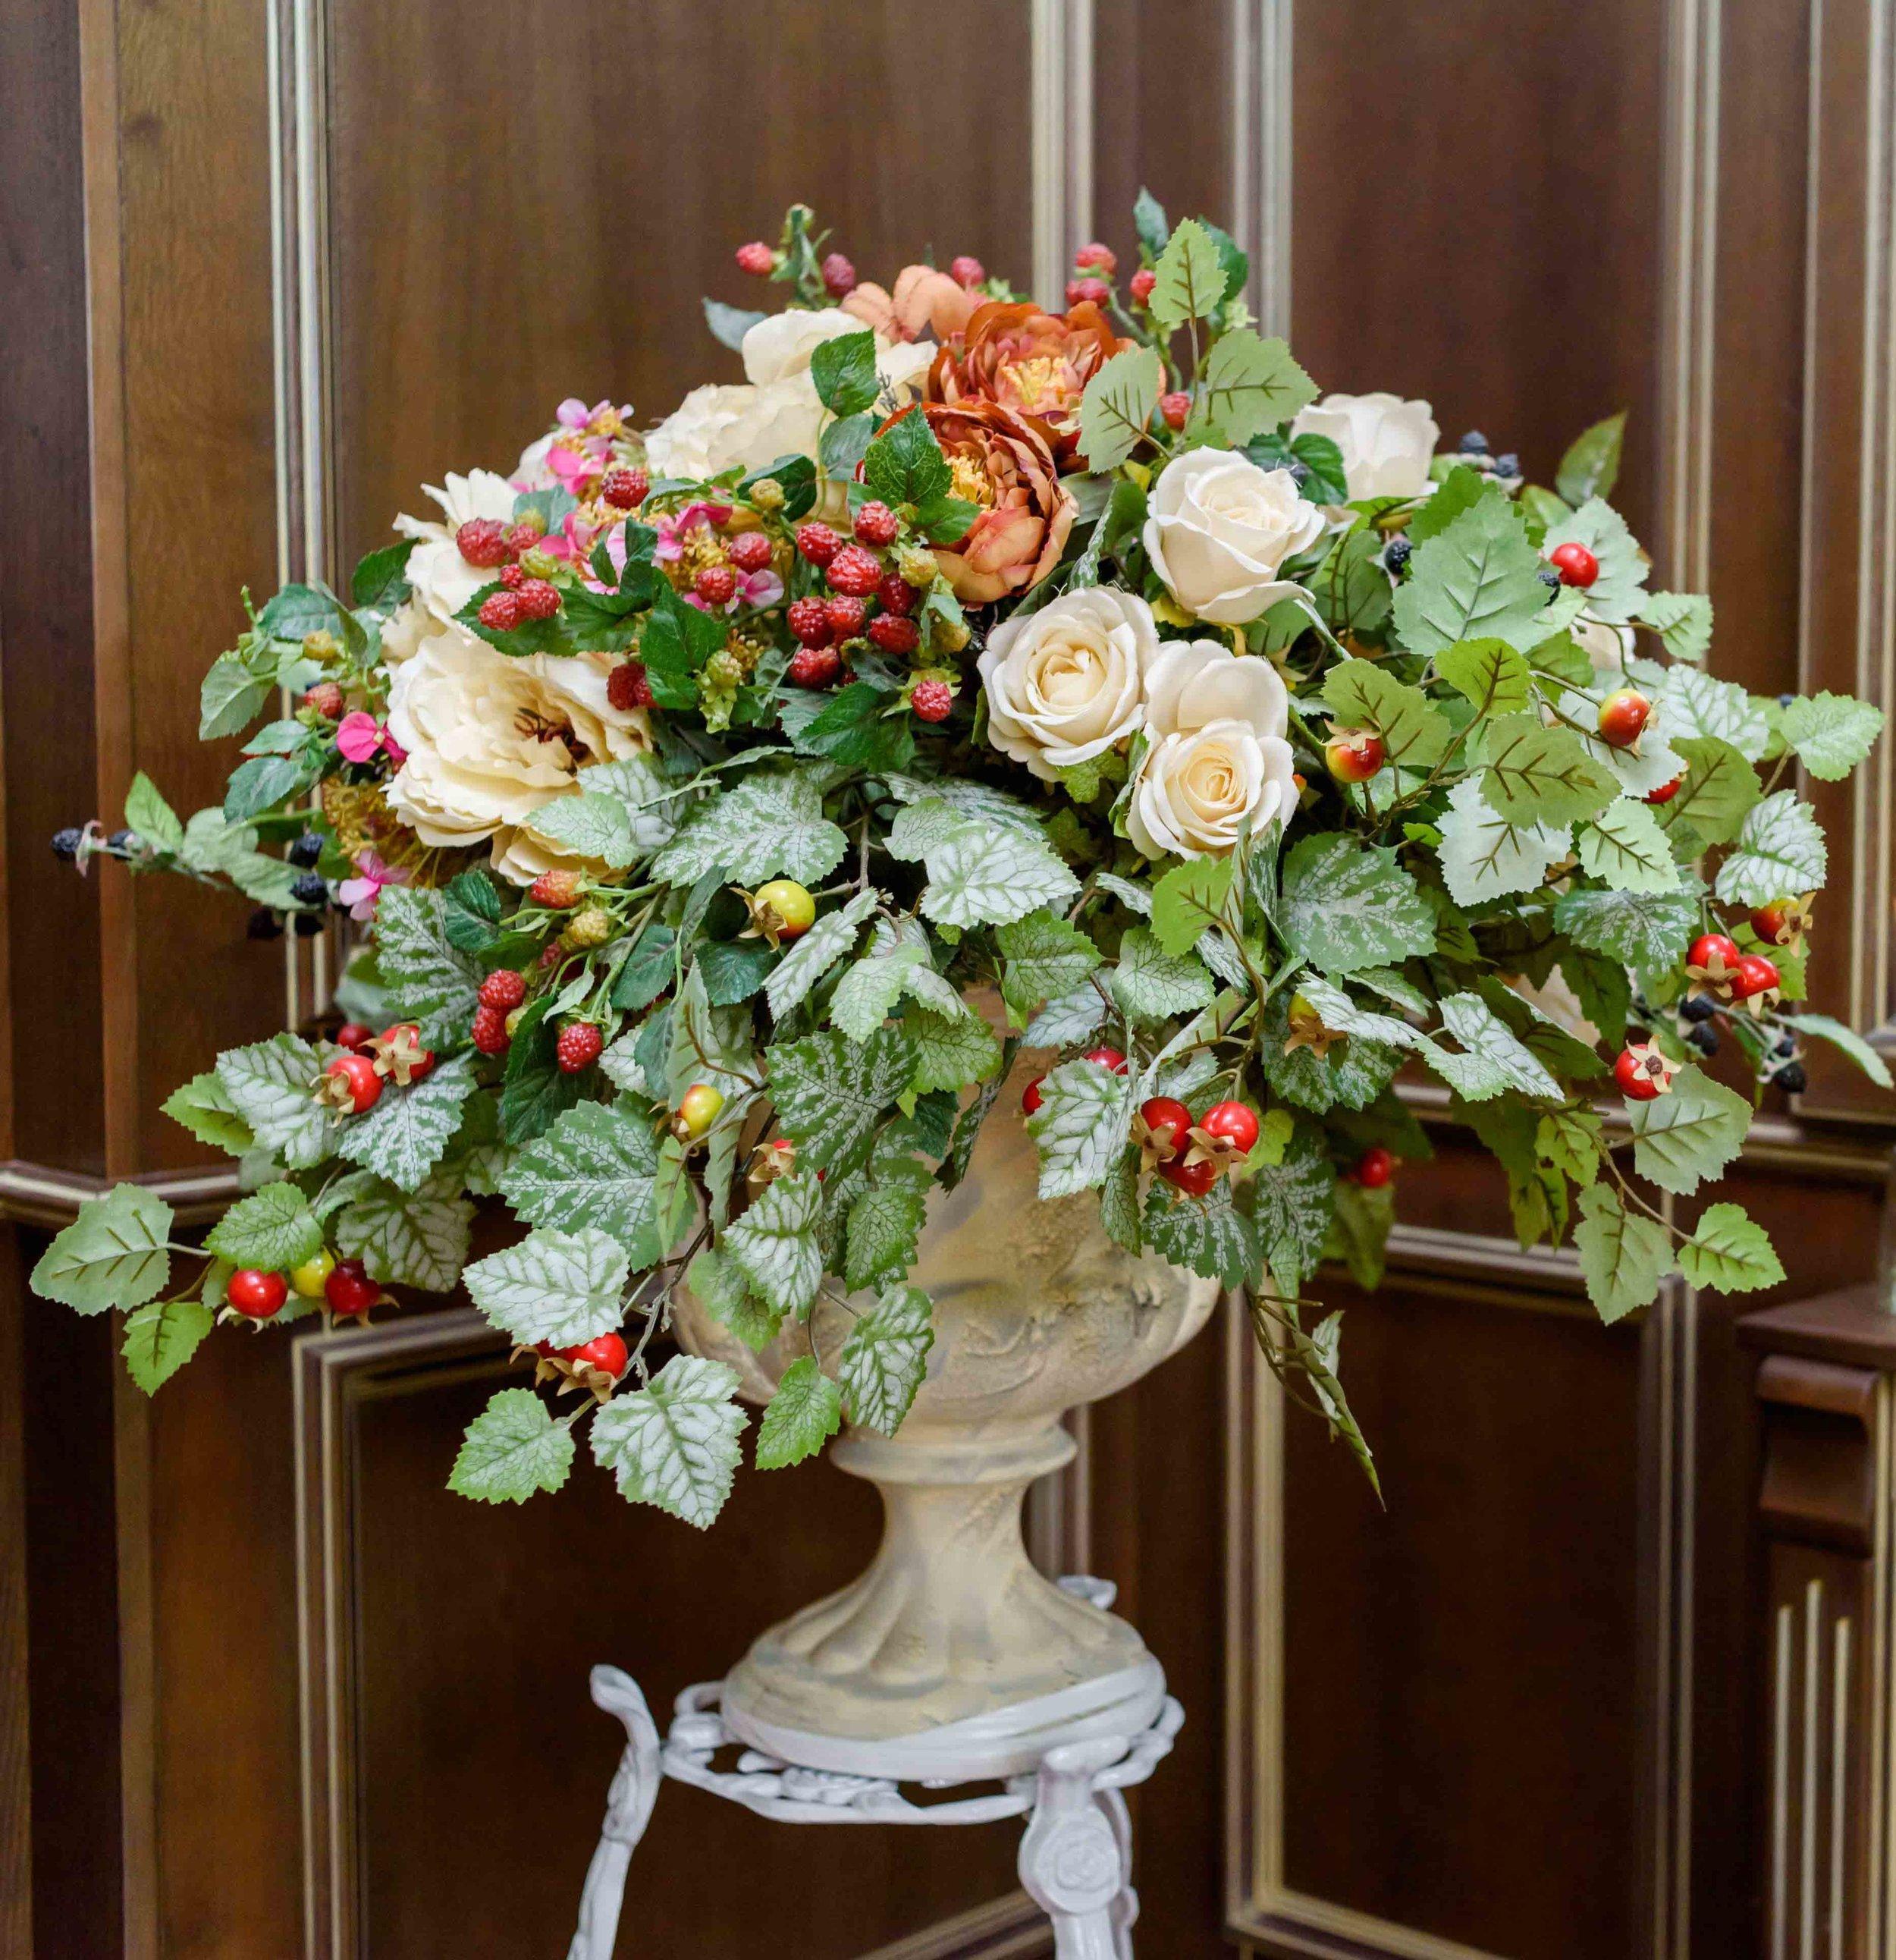 Office Artificial Flower Arrangements For Hire London Office Flowers London